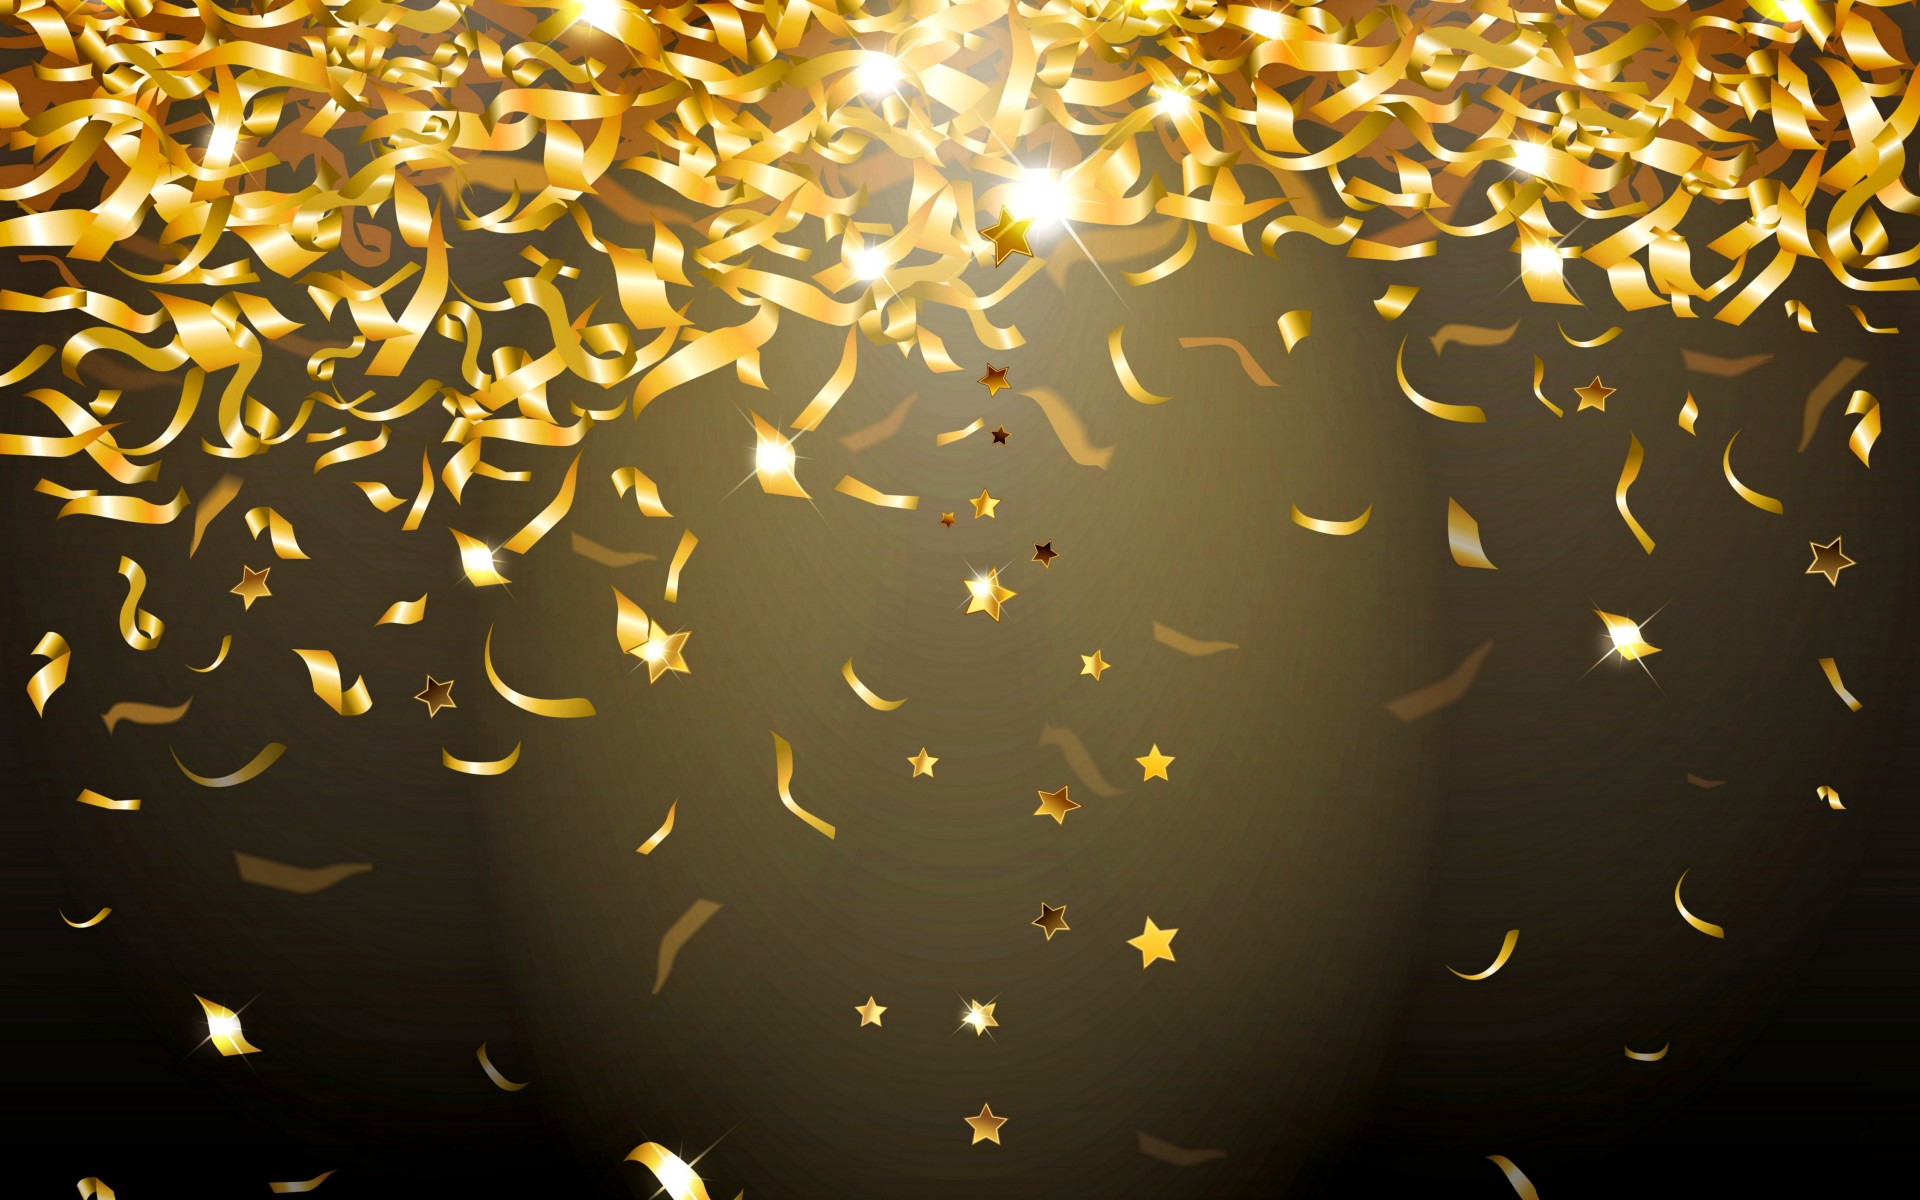 Falling Star Wallpaper Hd Gold Glitter Wallpaper Hd Pixelstalk Net